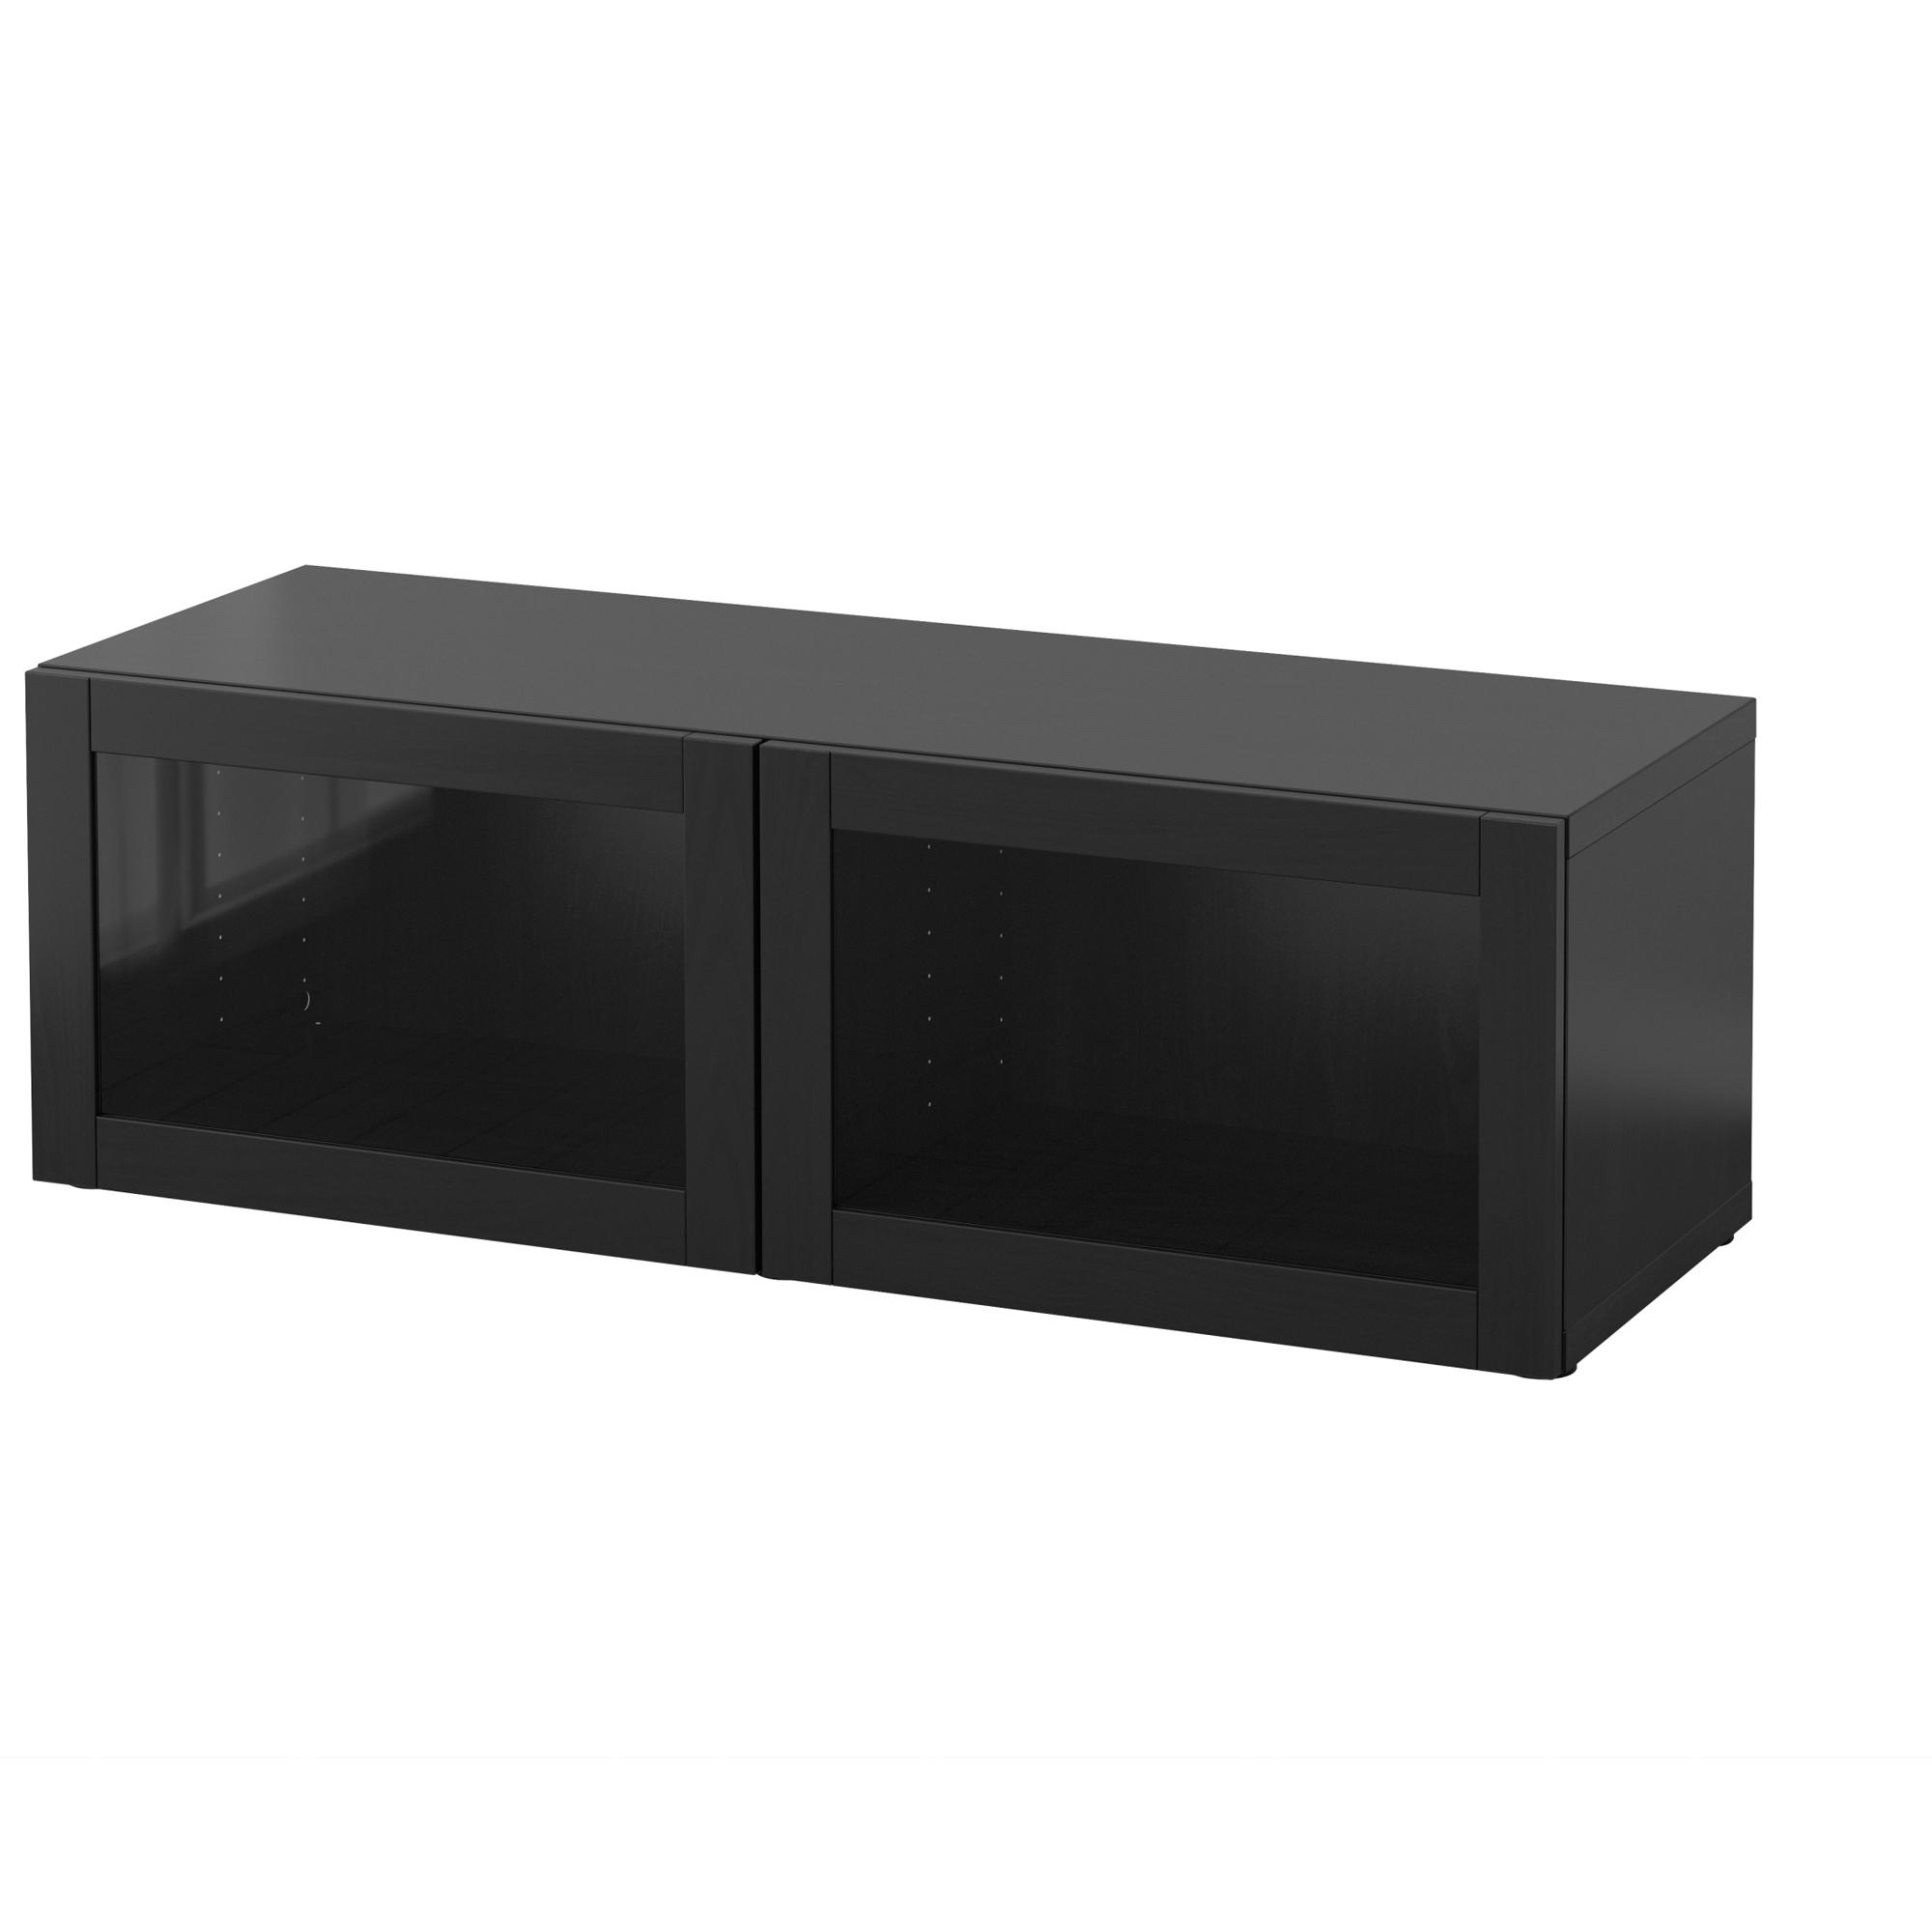 Best 197 Shelf Unit With Glass Doors